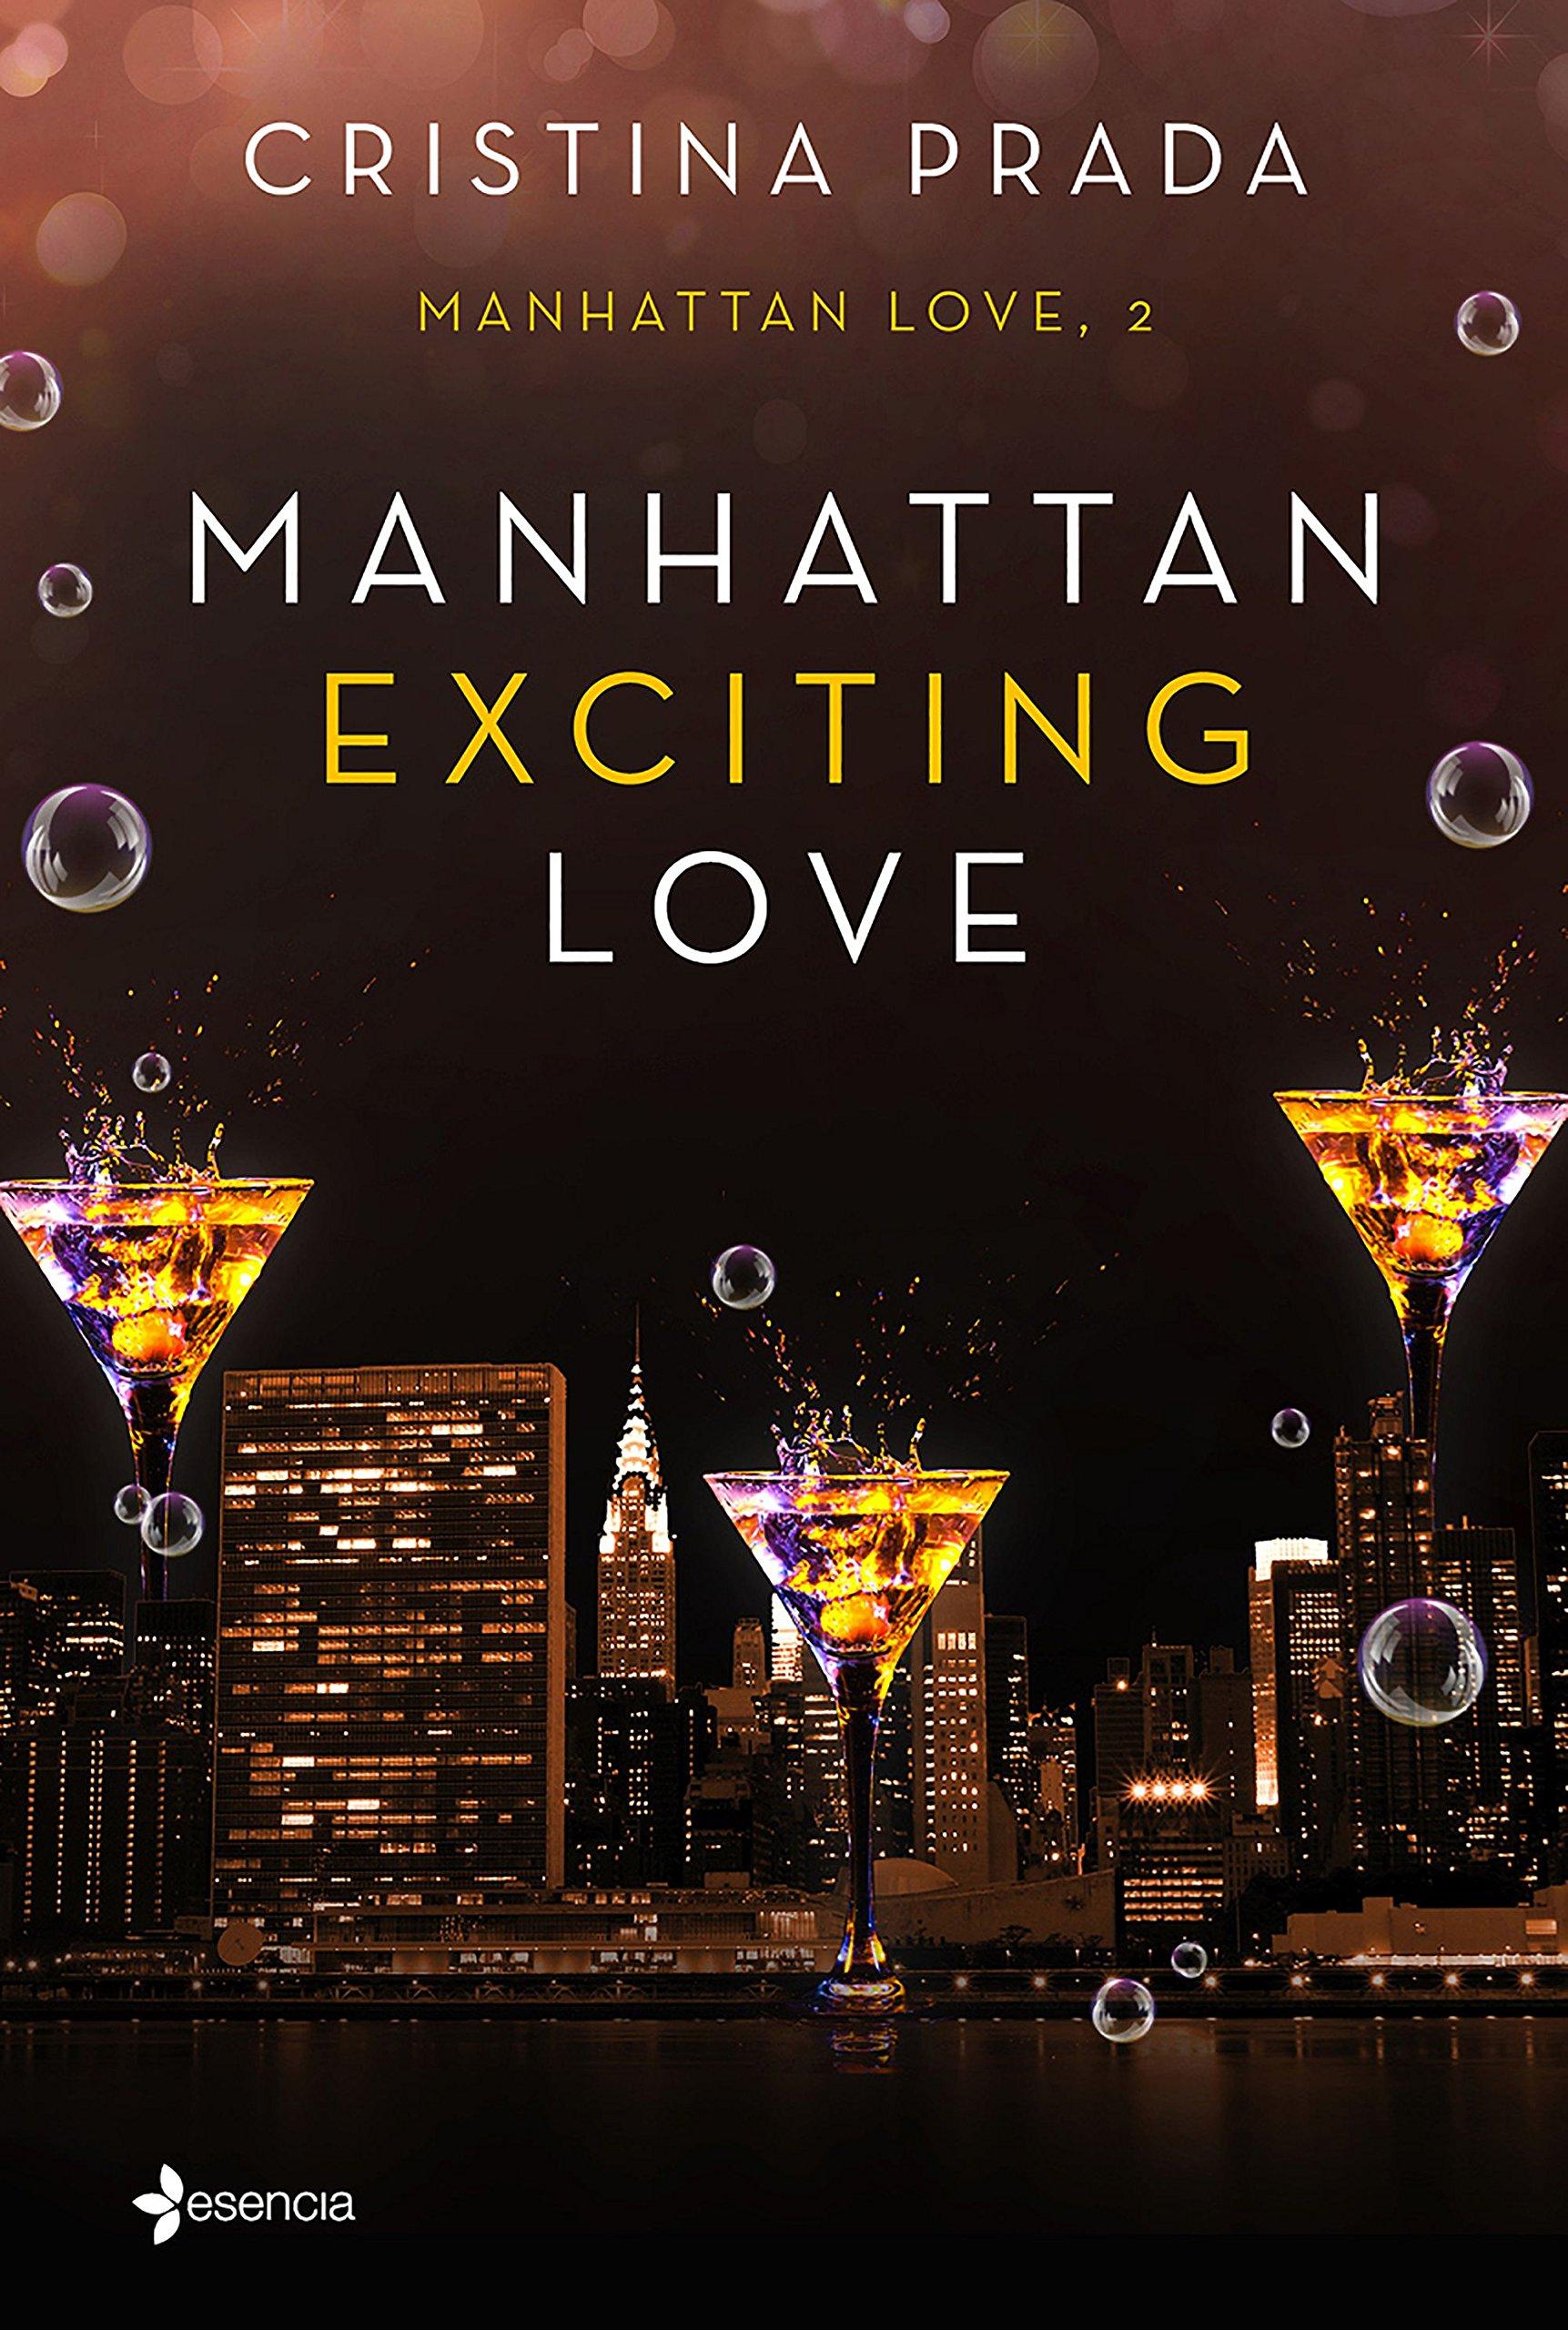 Manhattan Exciting Love: Manhattan Love, 2 (Erótica): Amazon.es: Prada, Cristina: Libros